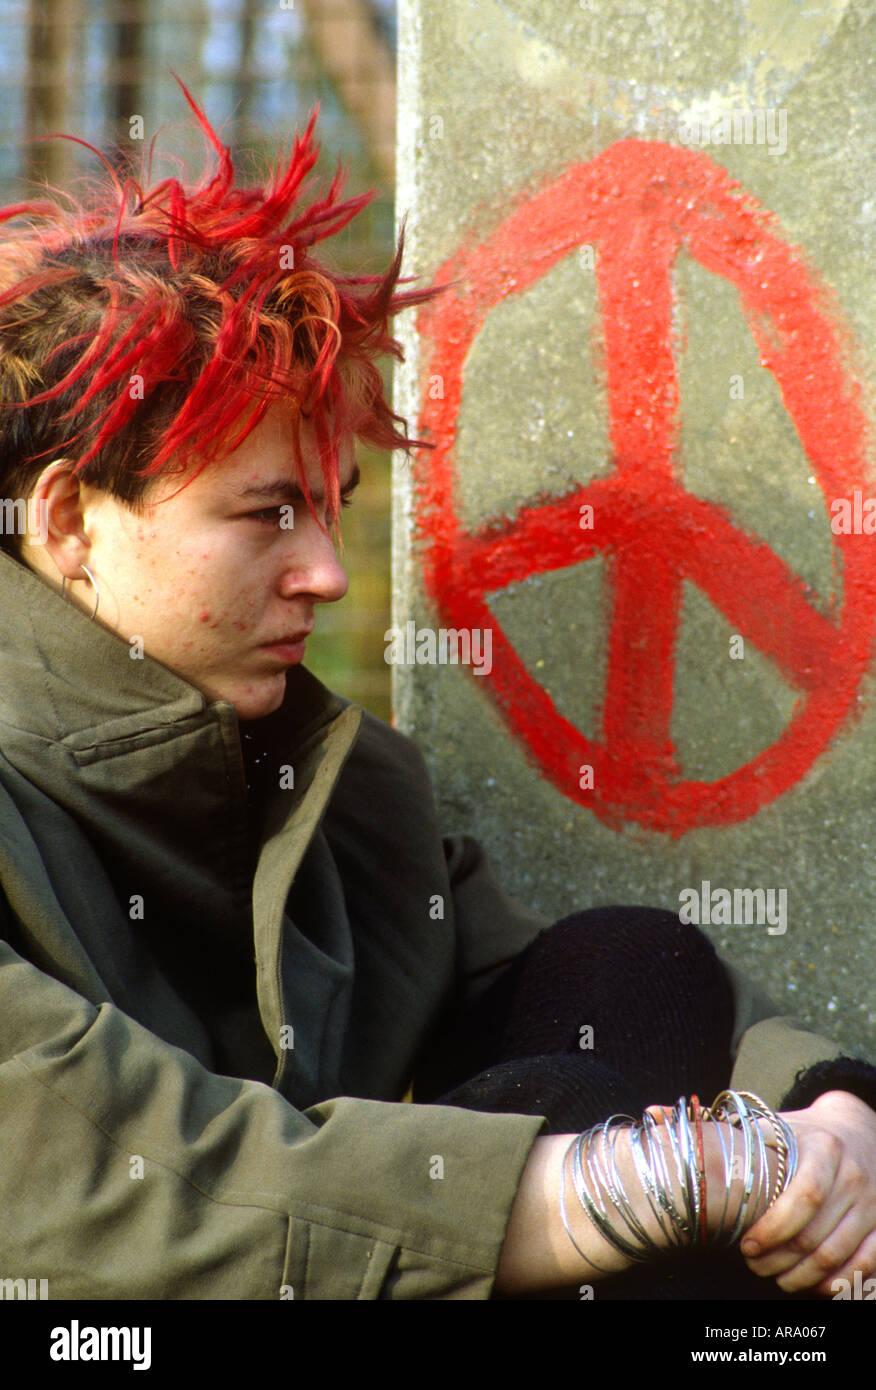 UK England Greenham Common Frauen Campen an Atomwaffen Basis in 1980 s SB zu protestieren Stockbild